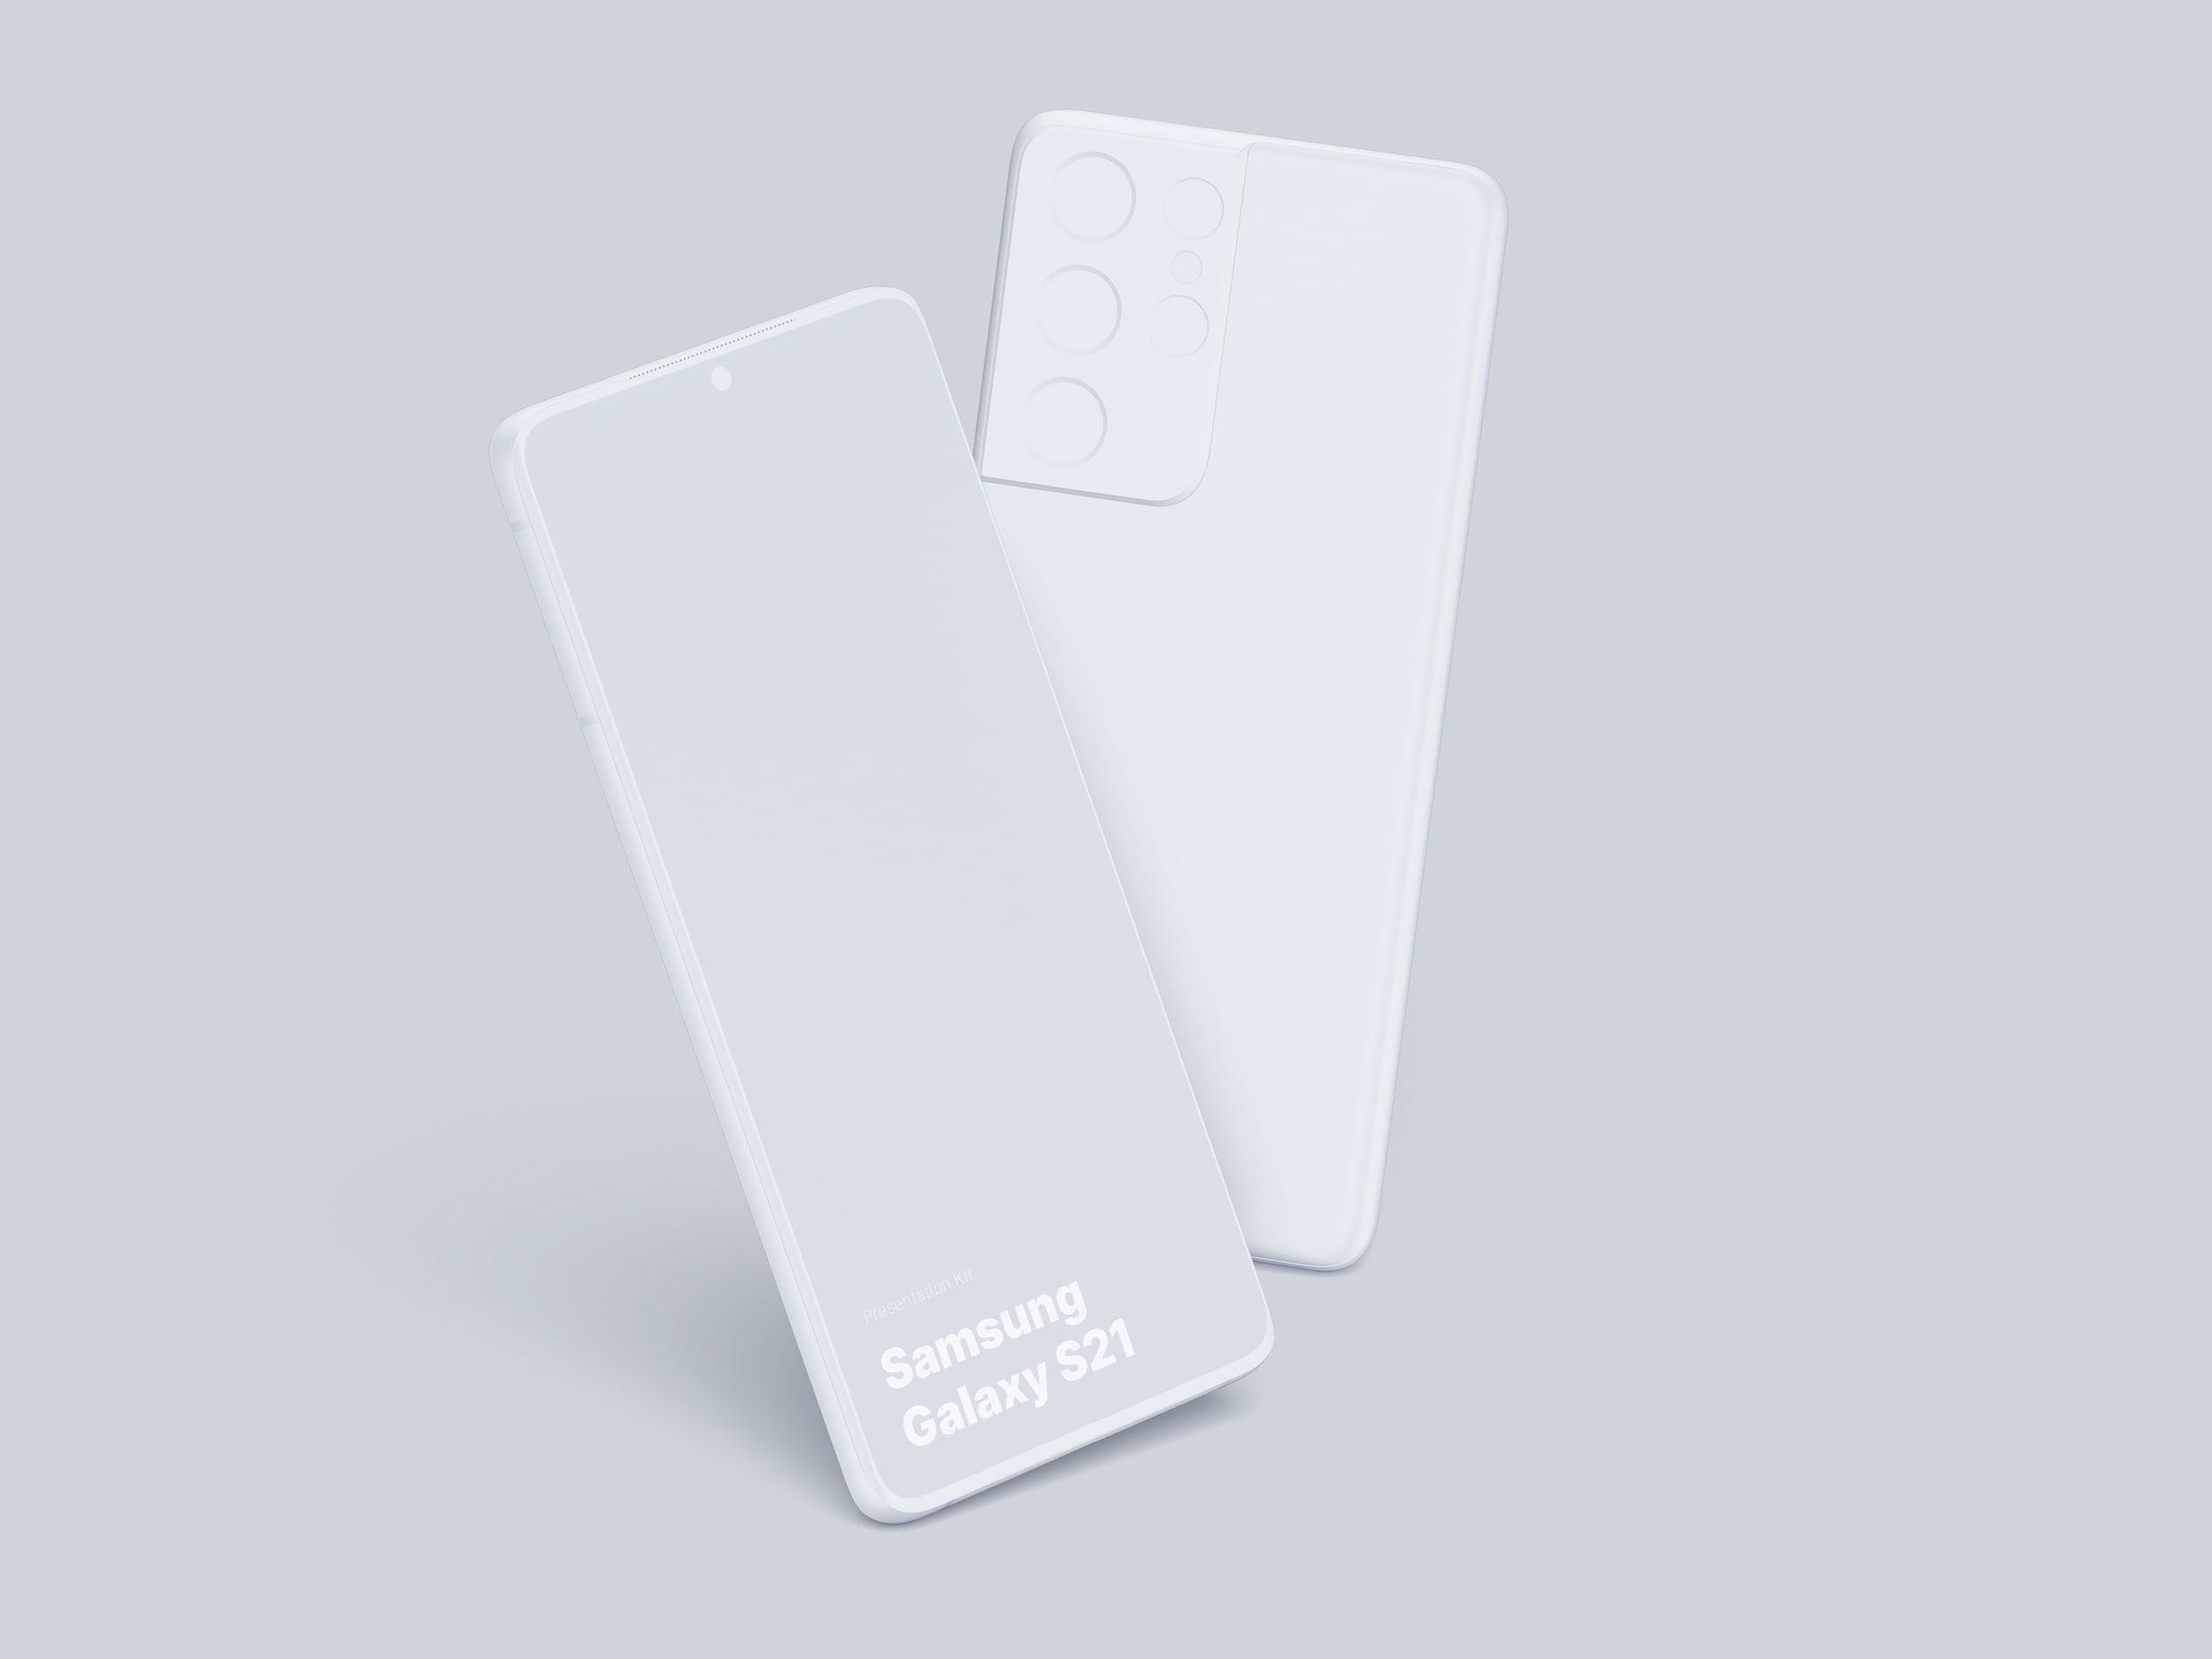 Samsung Galaxy S21 Ultra Mockups